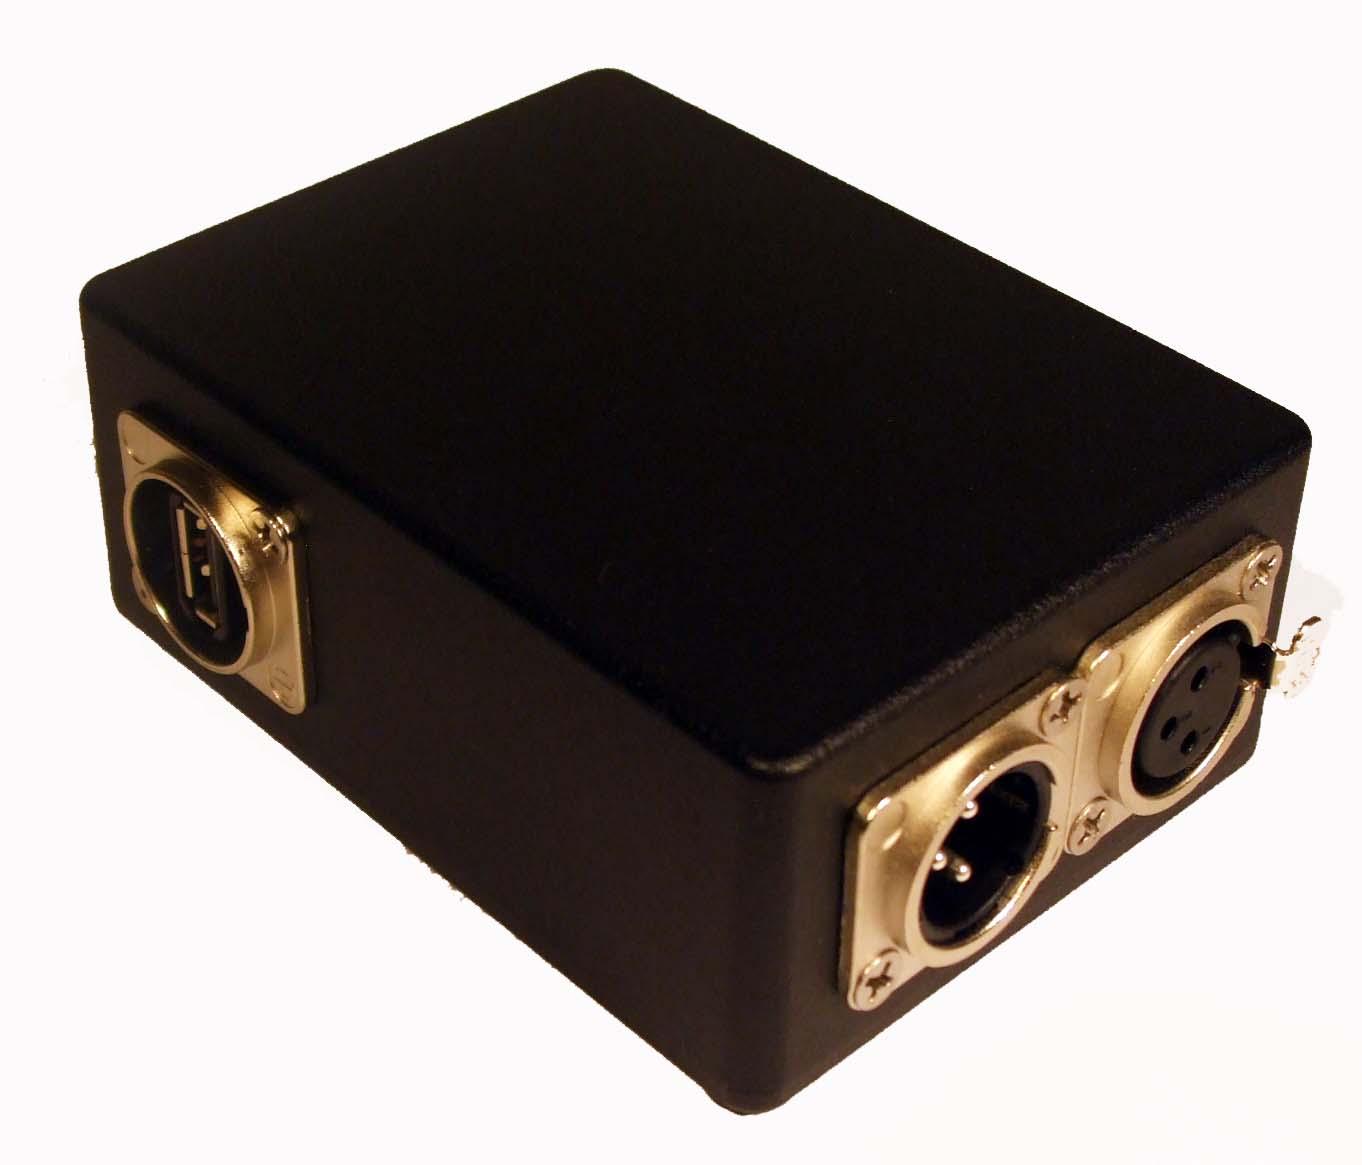 The intercom alert less disruptive than strobes or buzzers